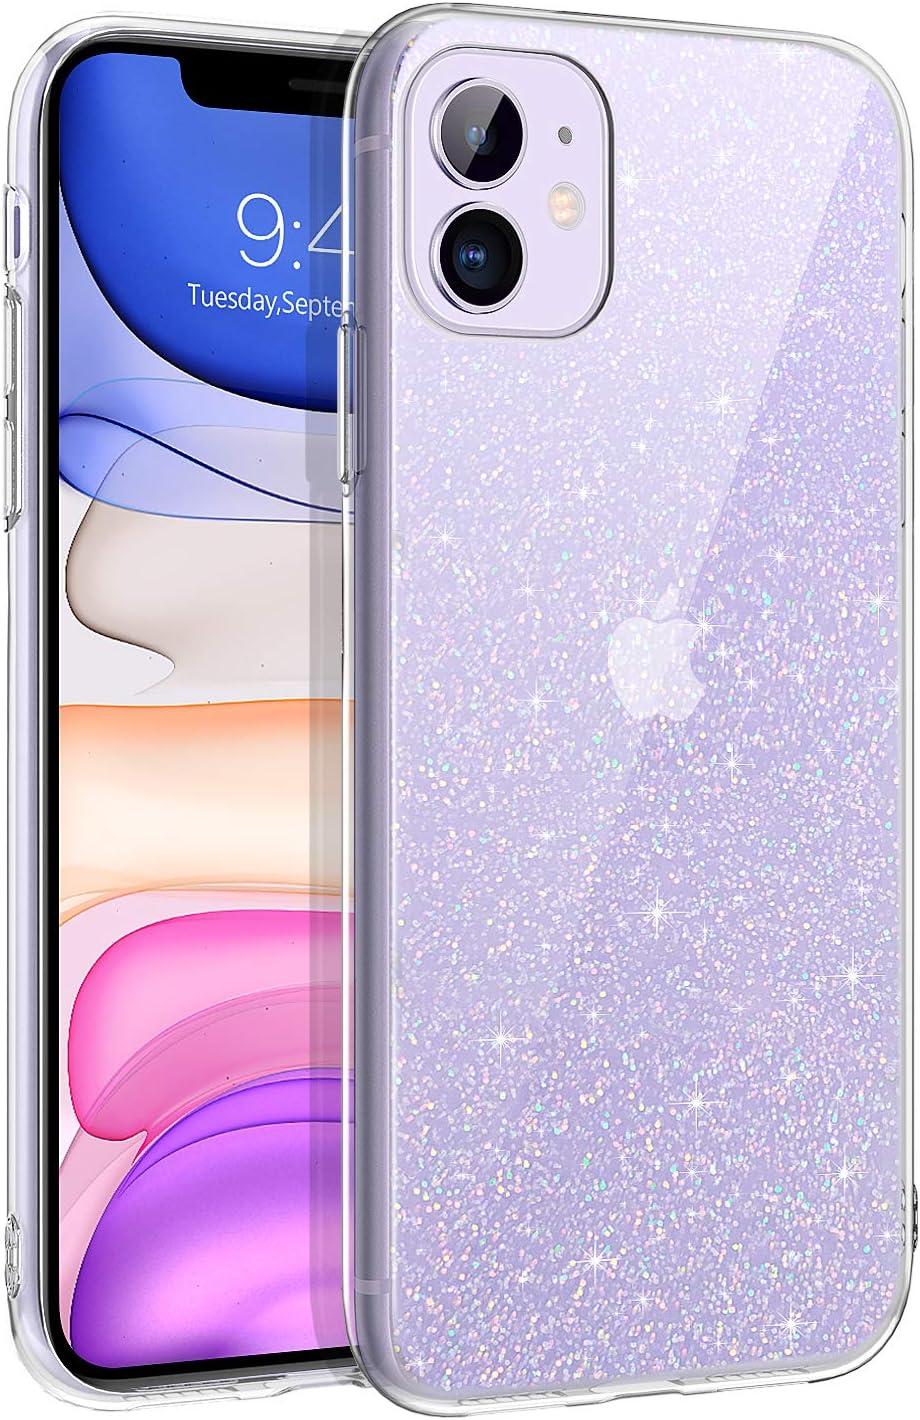 BENTOBEN Funda iPhone 11 Glitter, Carcasa iPhone 11 Ultra Delgada Case TPU Brillante Suave Silicone Transparente Claro Protectora Resistente Anti-Golpes Funda para iPhone 11 2019 6,1 '' Bling Claro